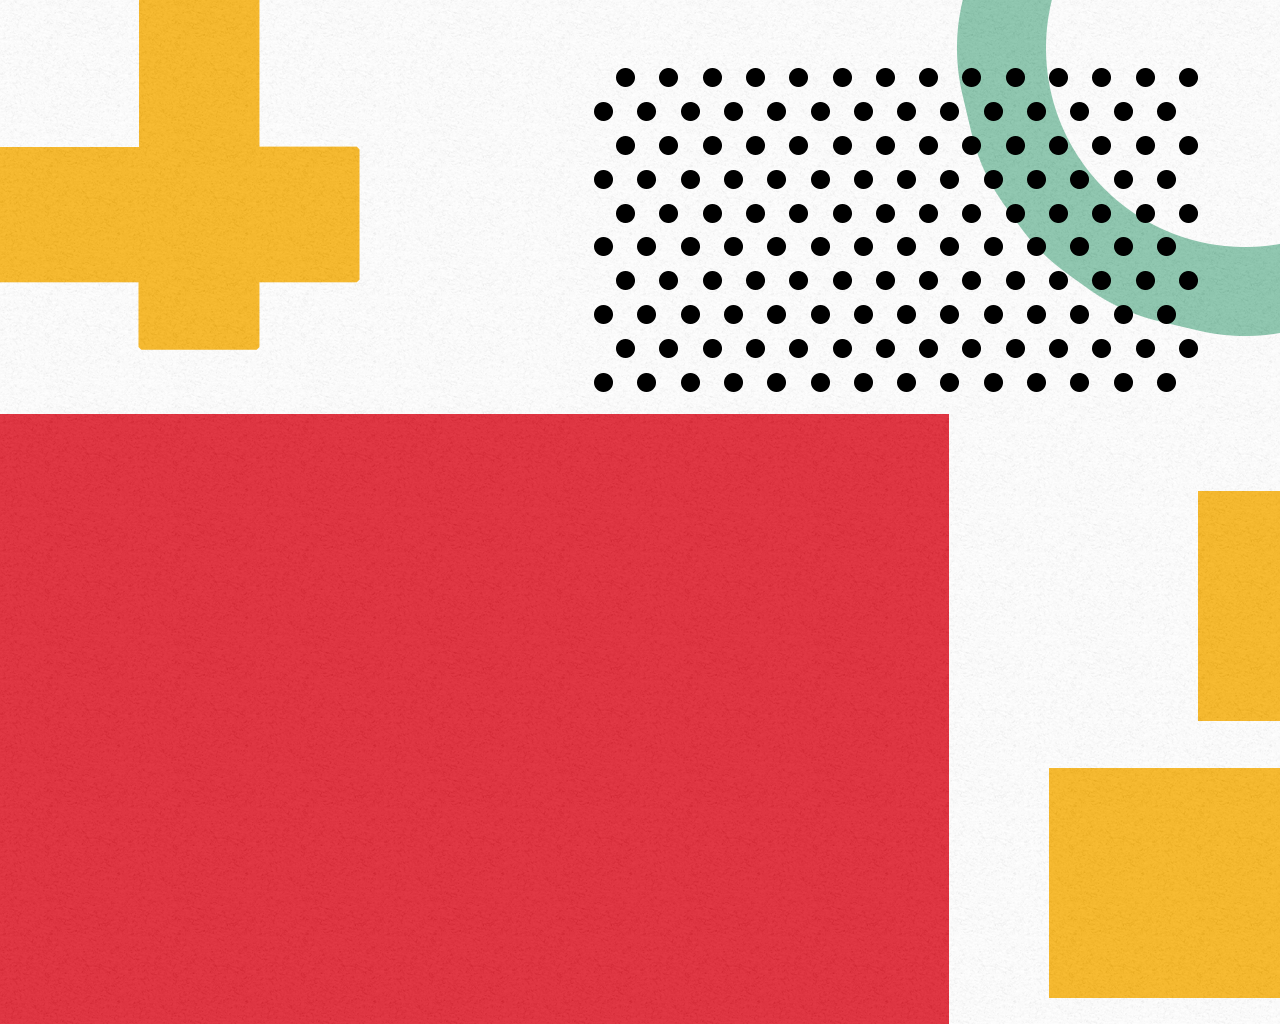 creative background design vector free download